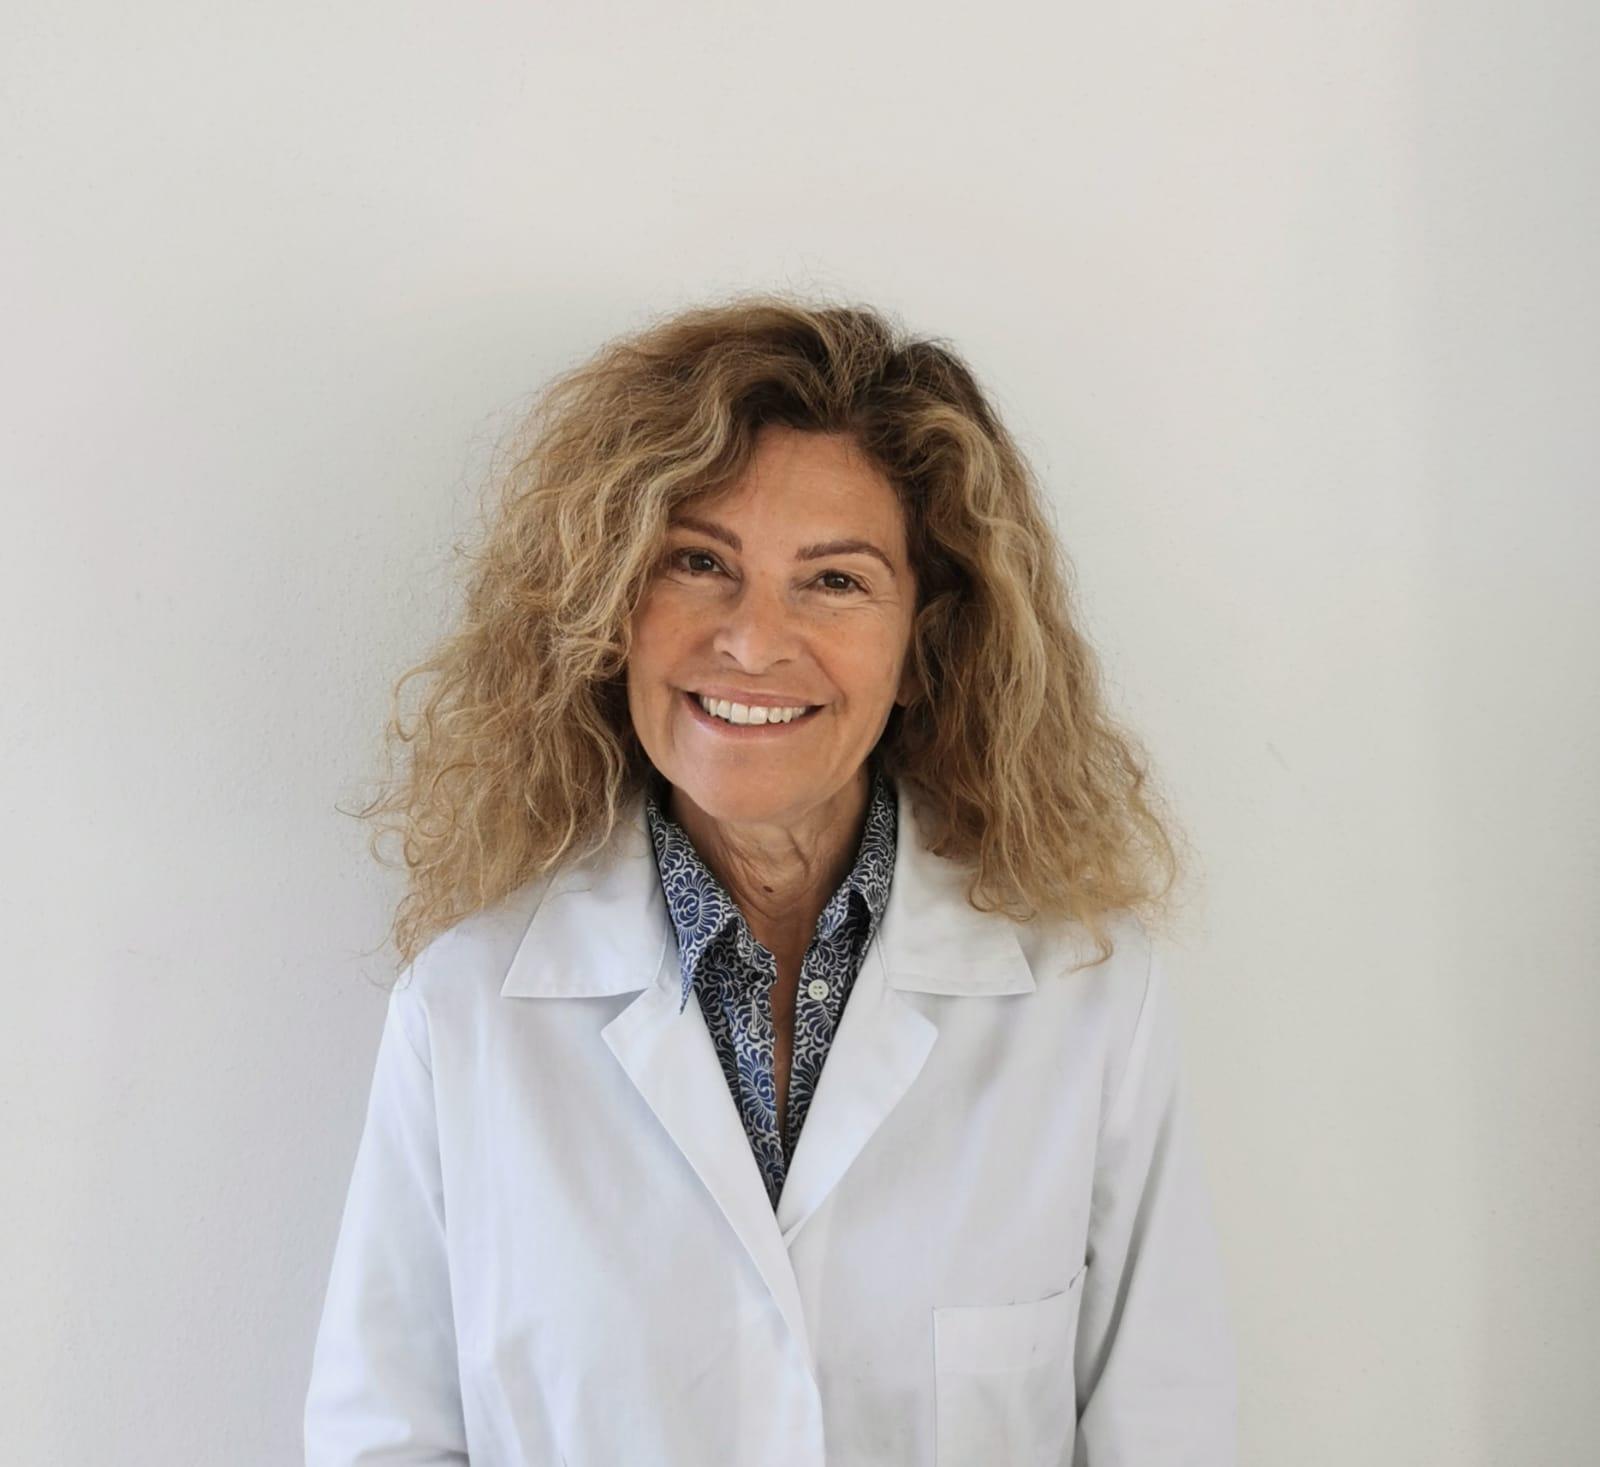 Dott.ssa Loredana Lauro